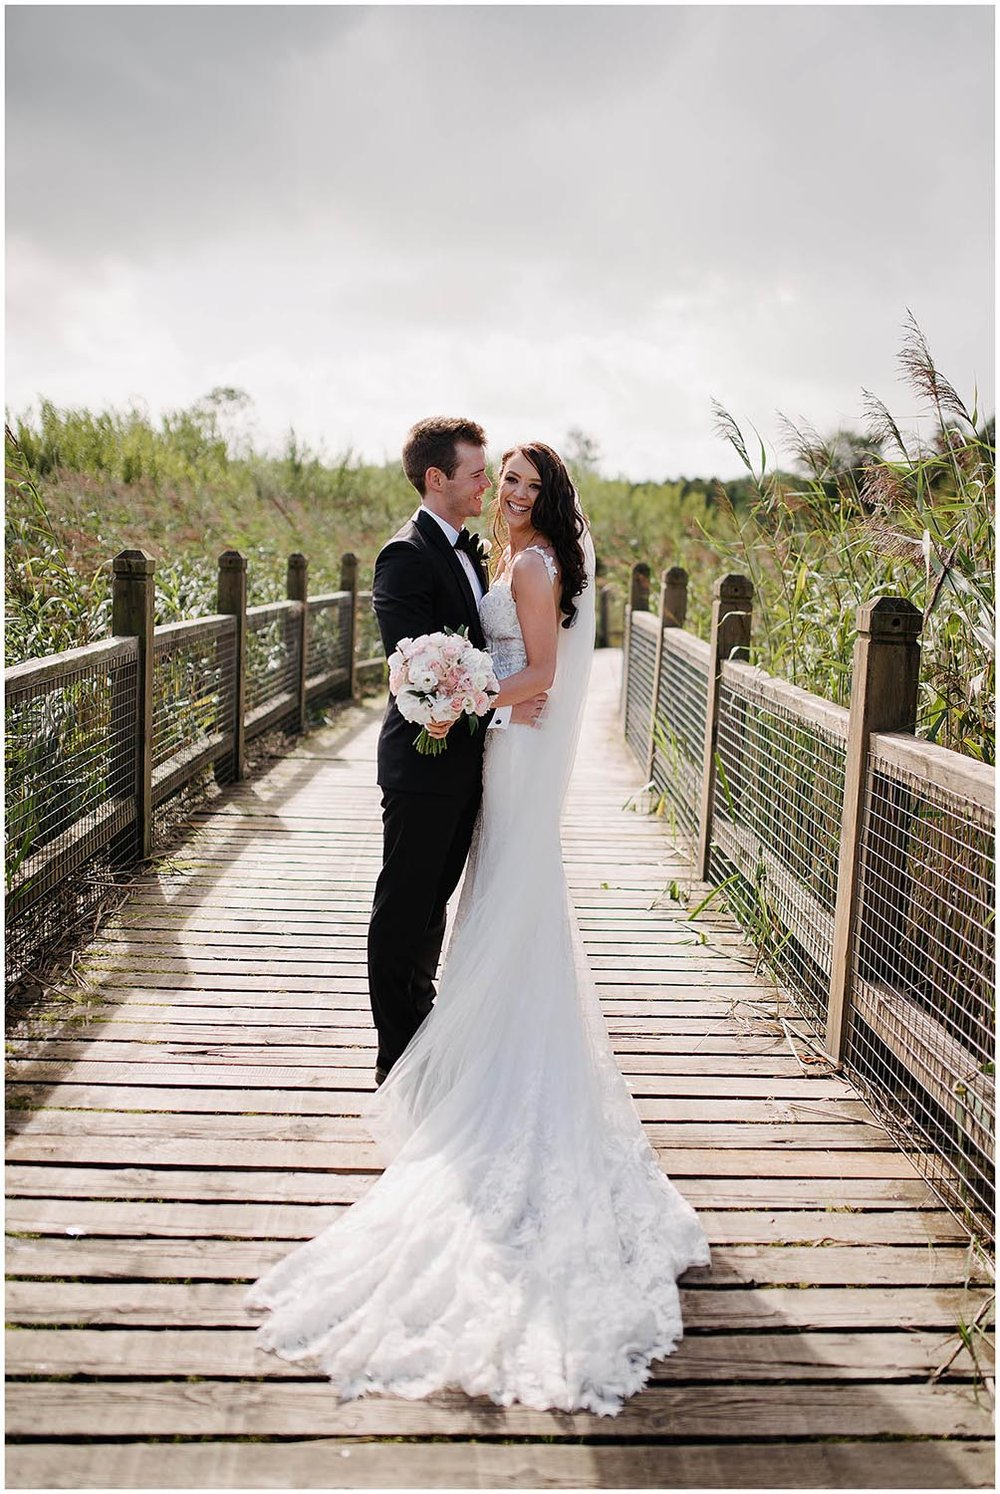 lough-erne-resort-Irish-wedding-photographer-jude-browne-photography_0327.JPG